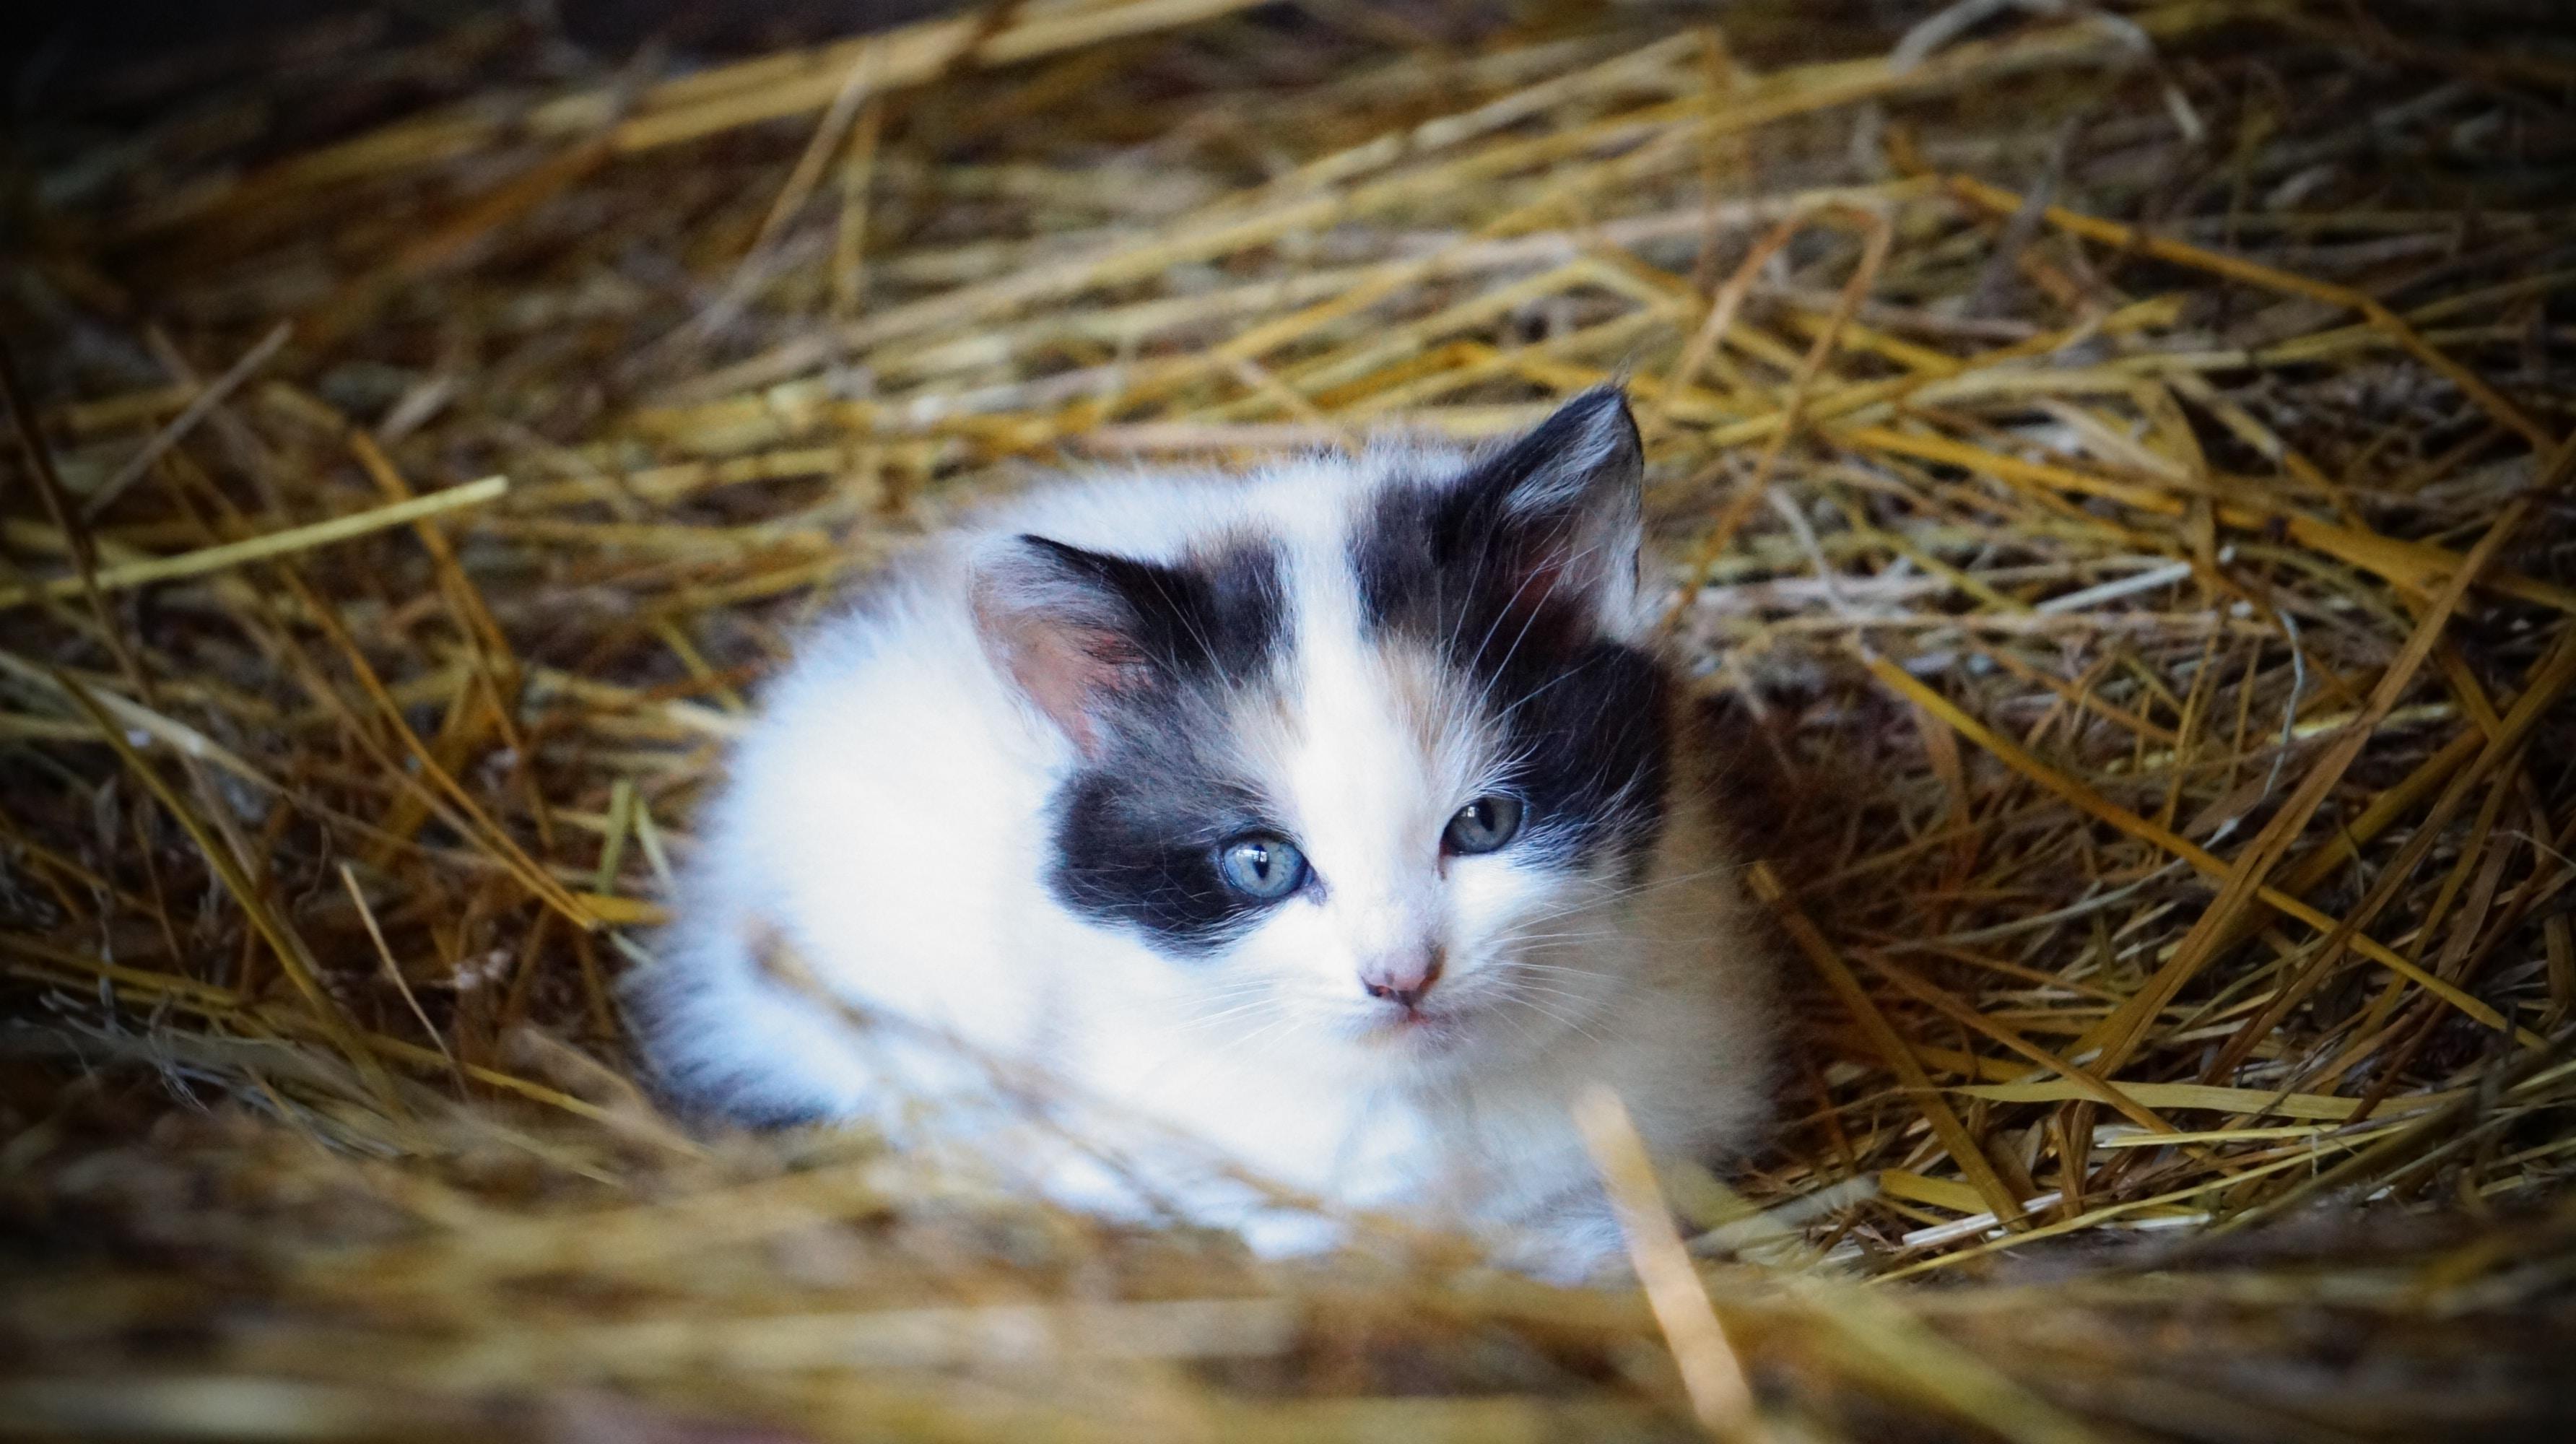 kittens: part 1 stories